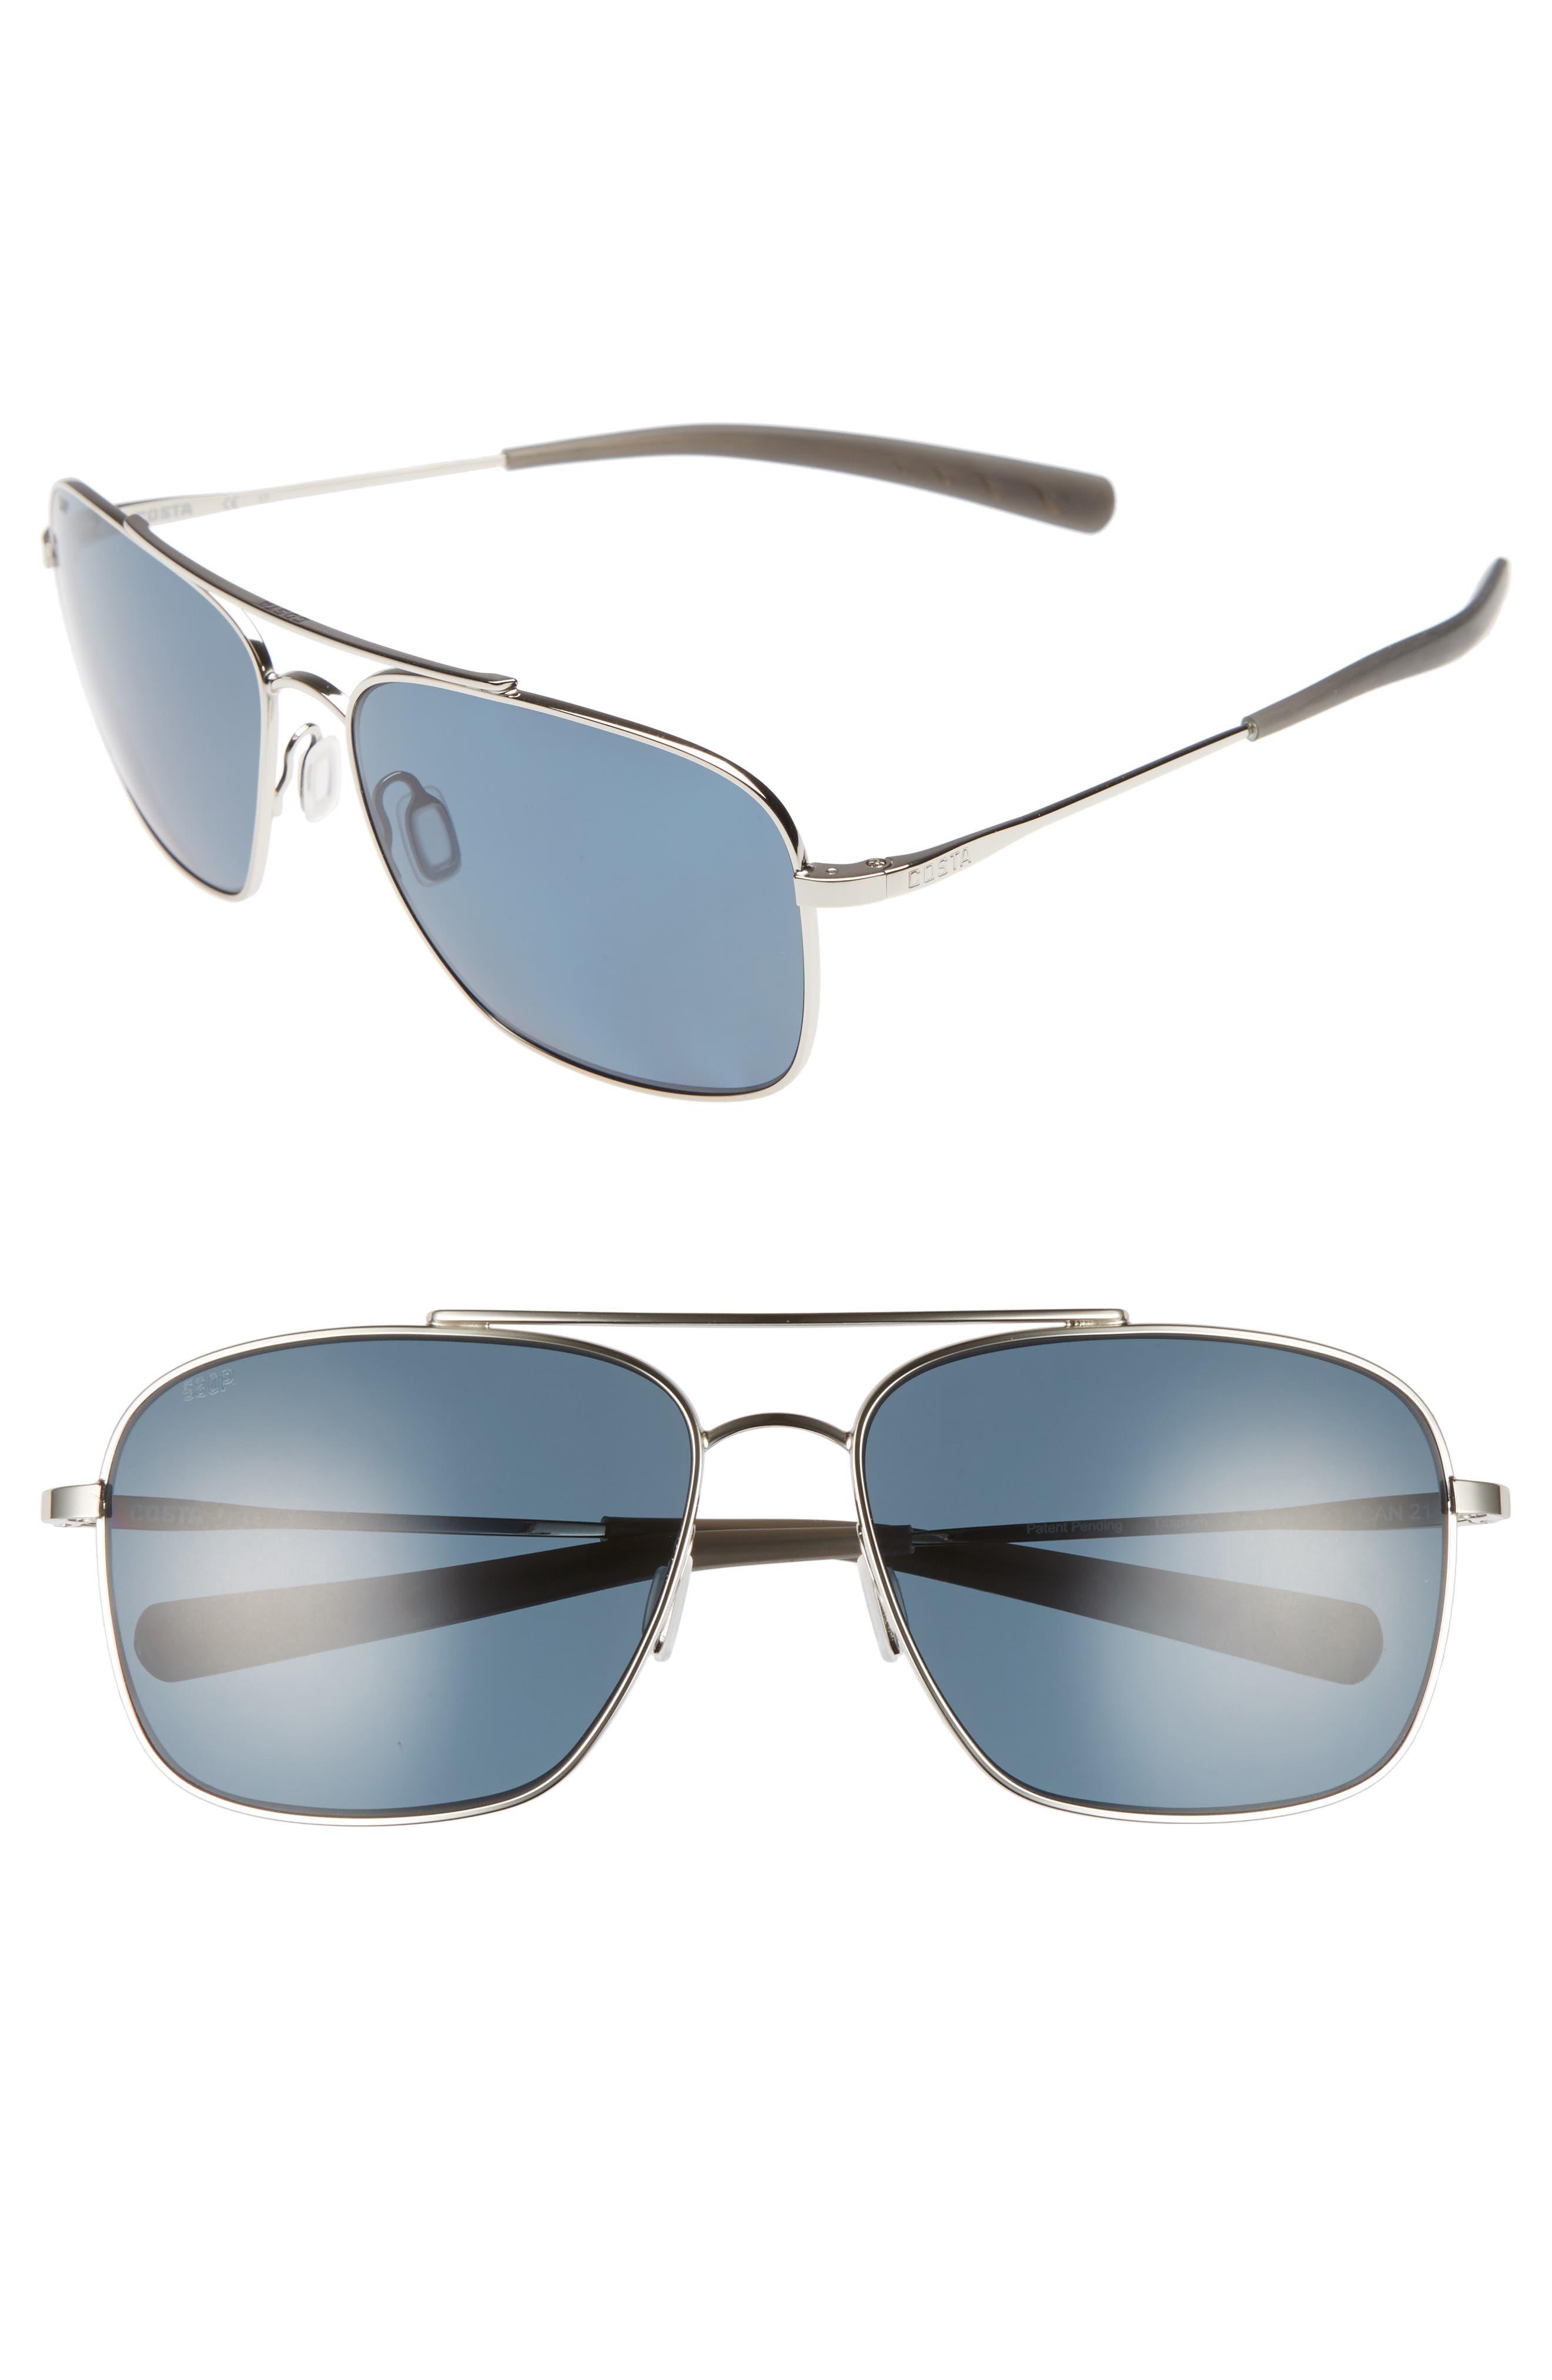 Canaveral 58mm Polarized Sunglasses,                         Main,                         color, Shiny Palladium/ Grey